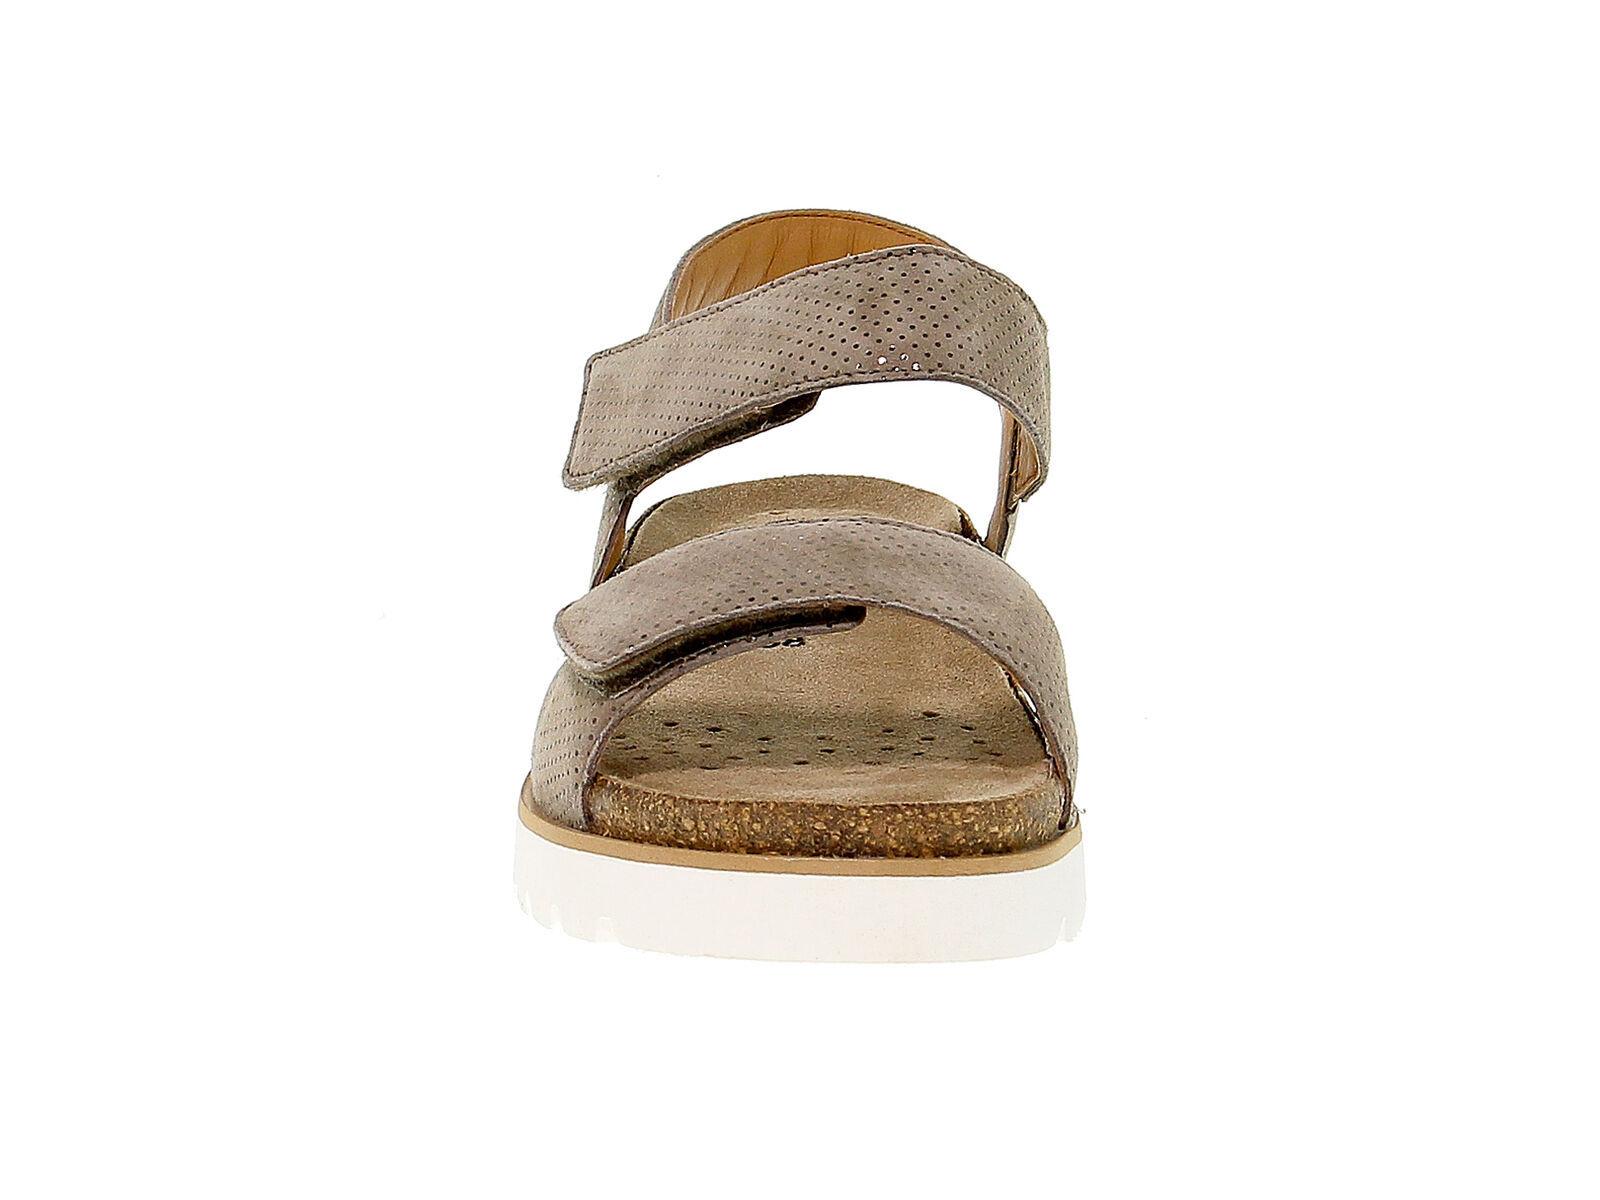 Sandalo basso MEPHISTO THELMA in nabuk cammello - Scarpe Donna